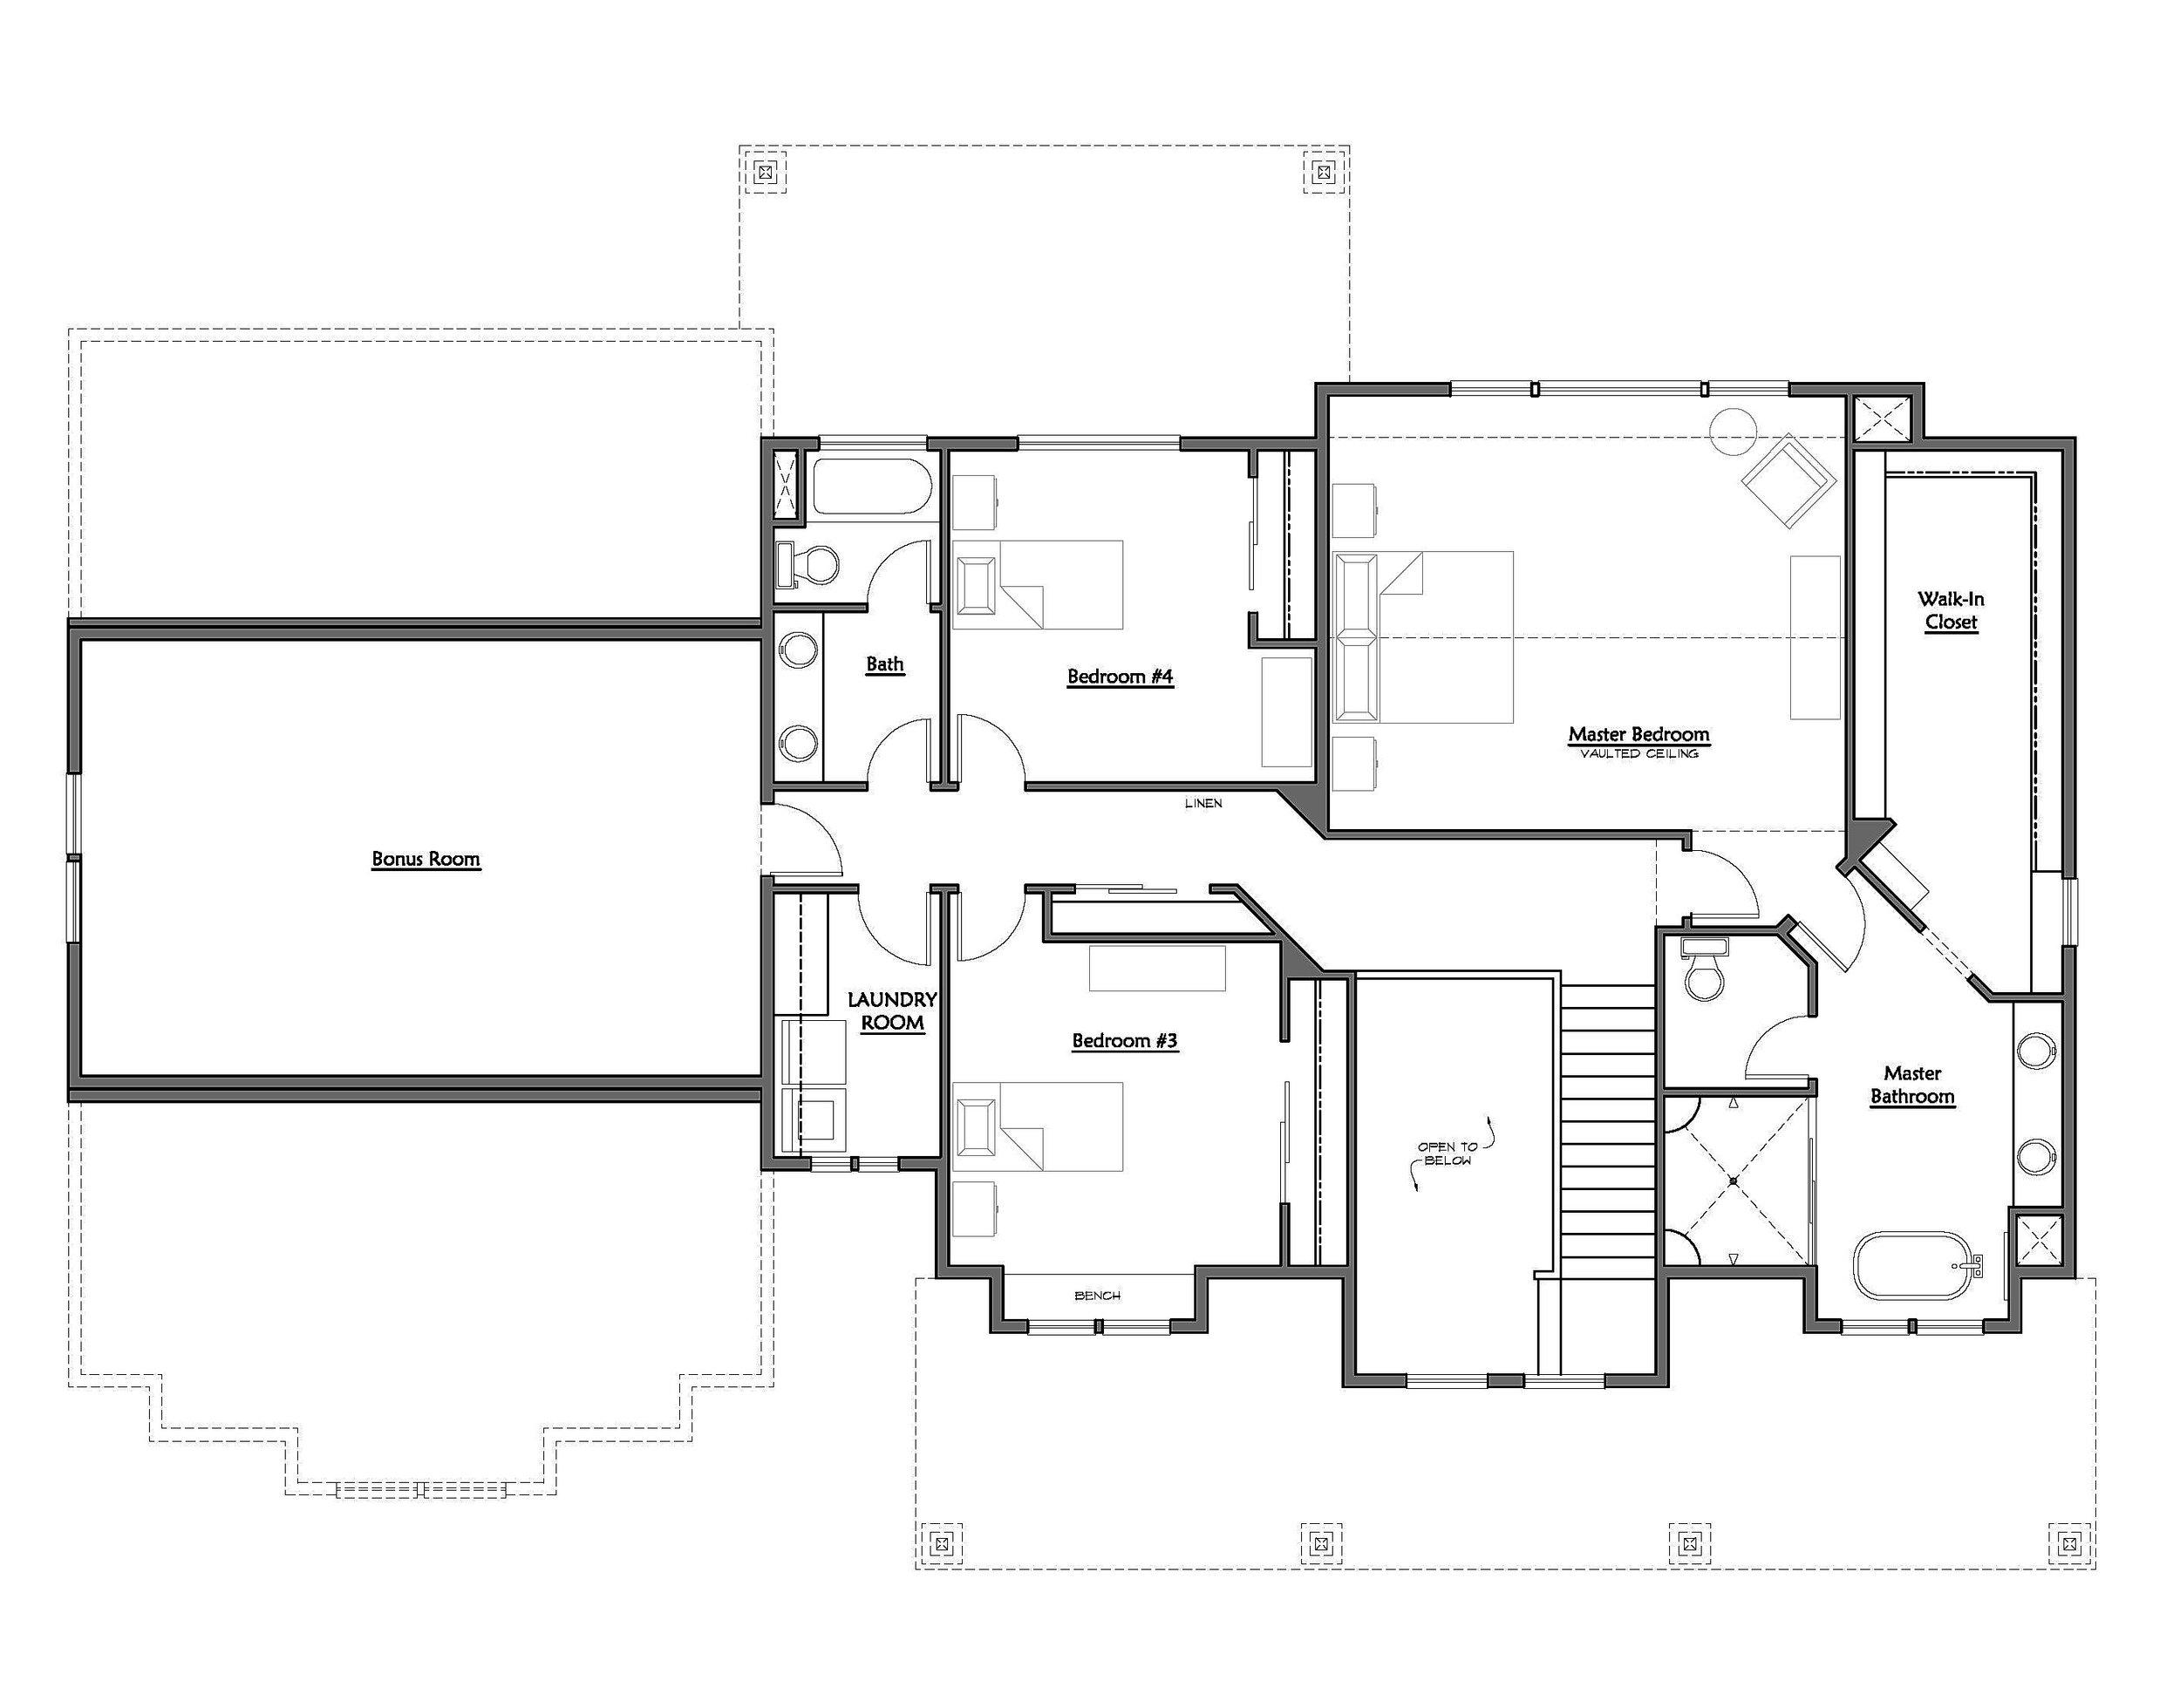 Marketing Floor Plans 1-19-17 Model (2).jpg